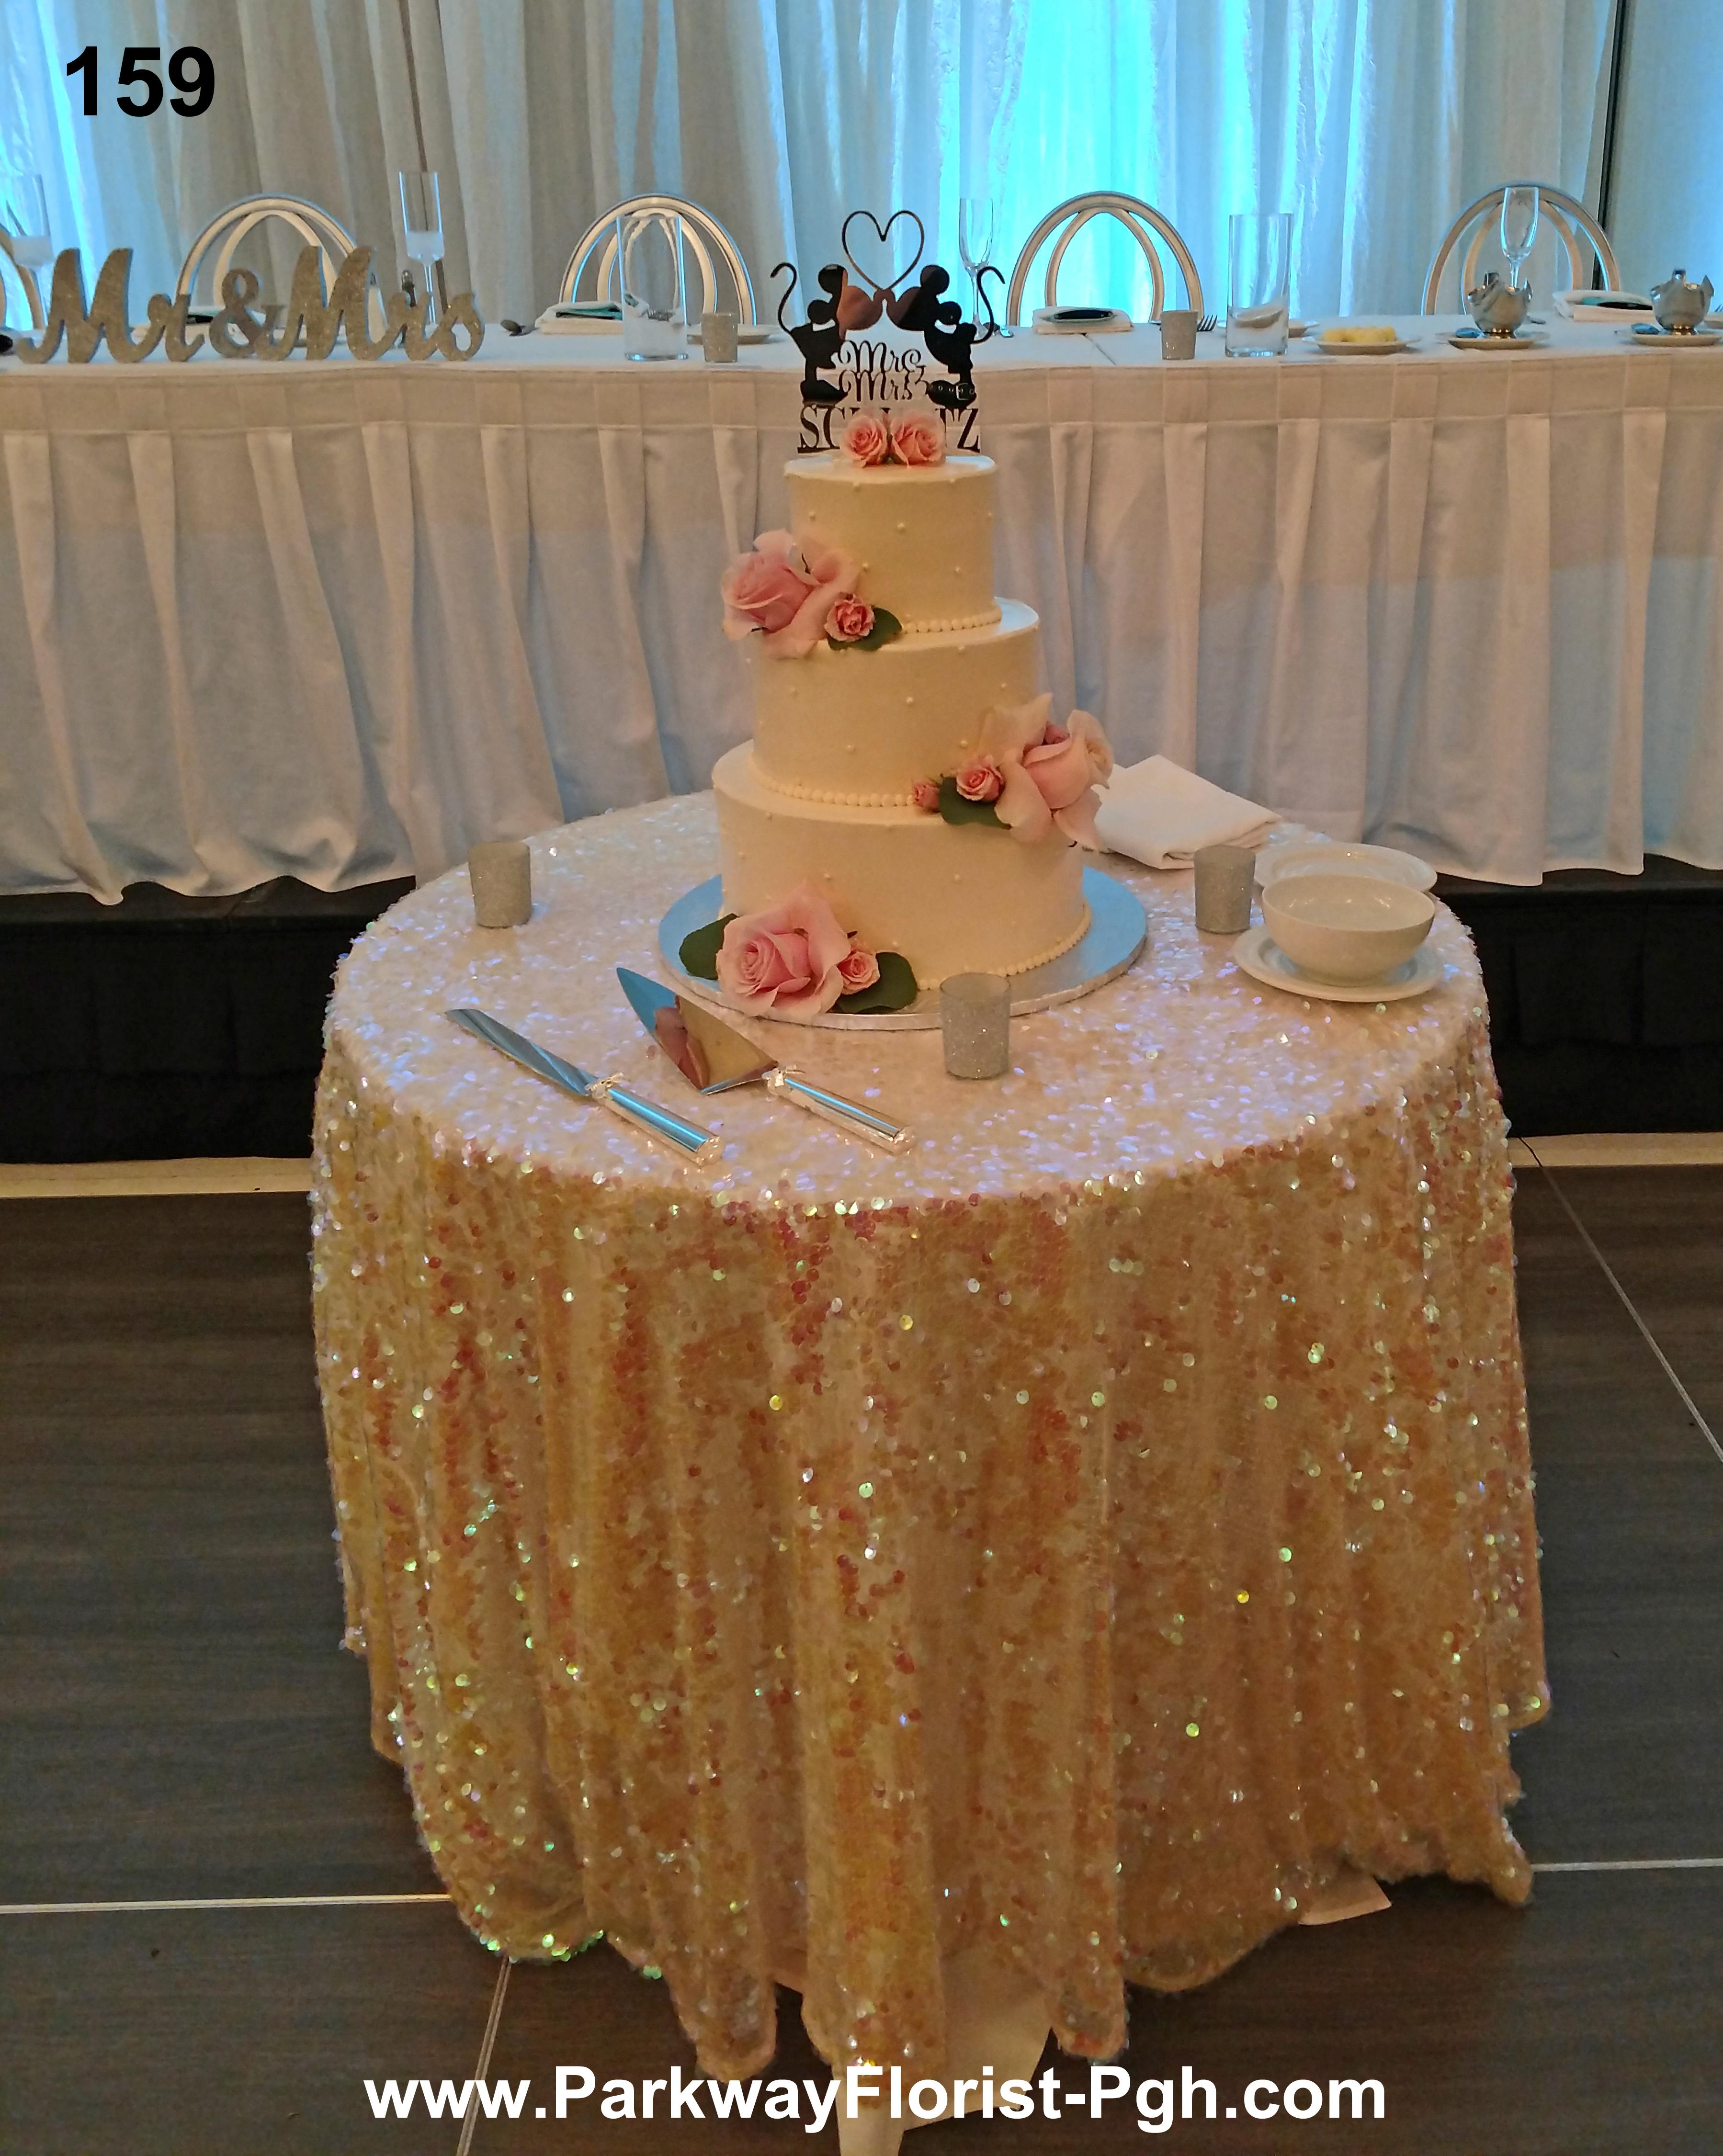 cake 159